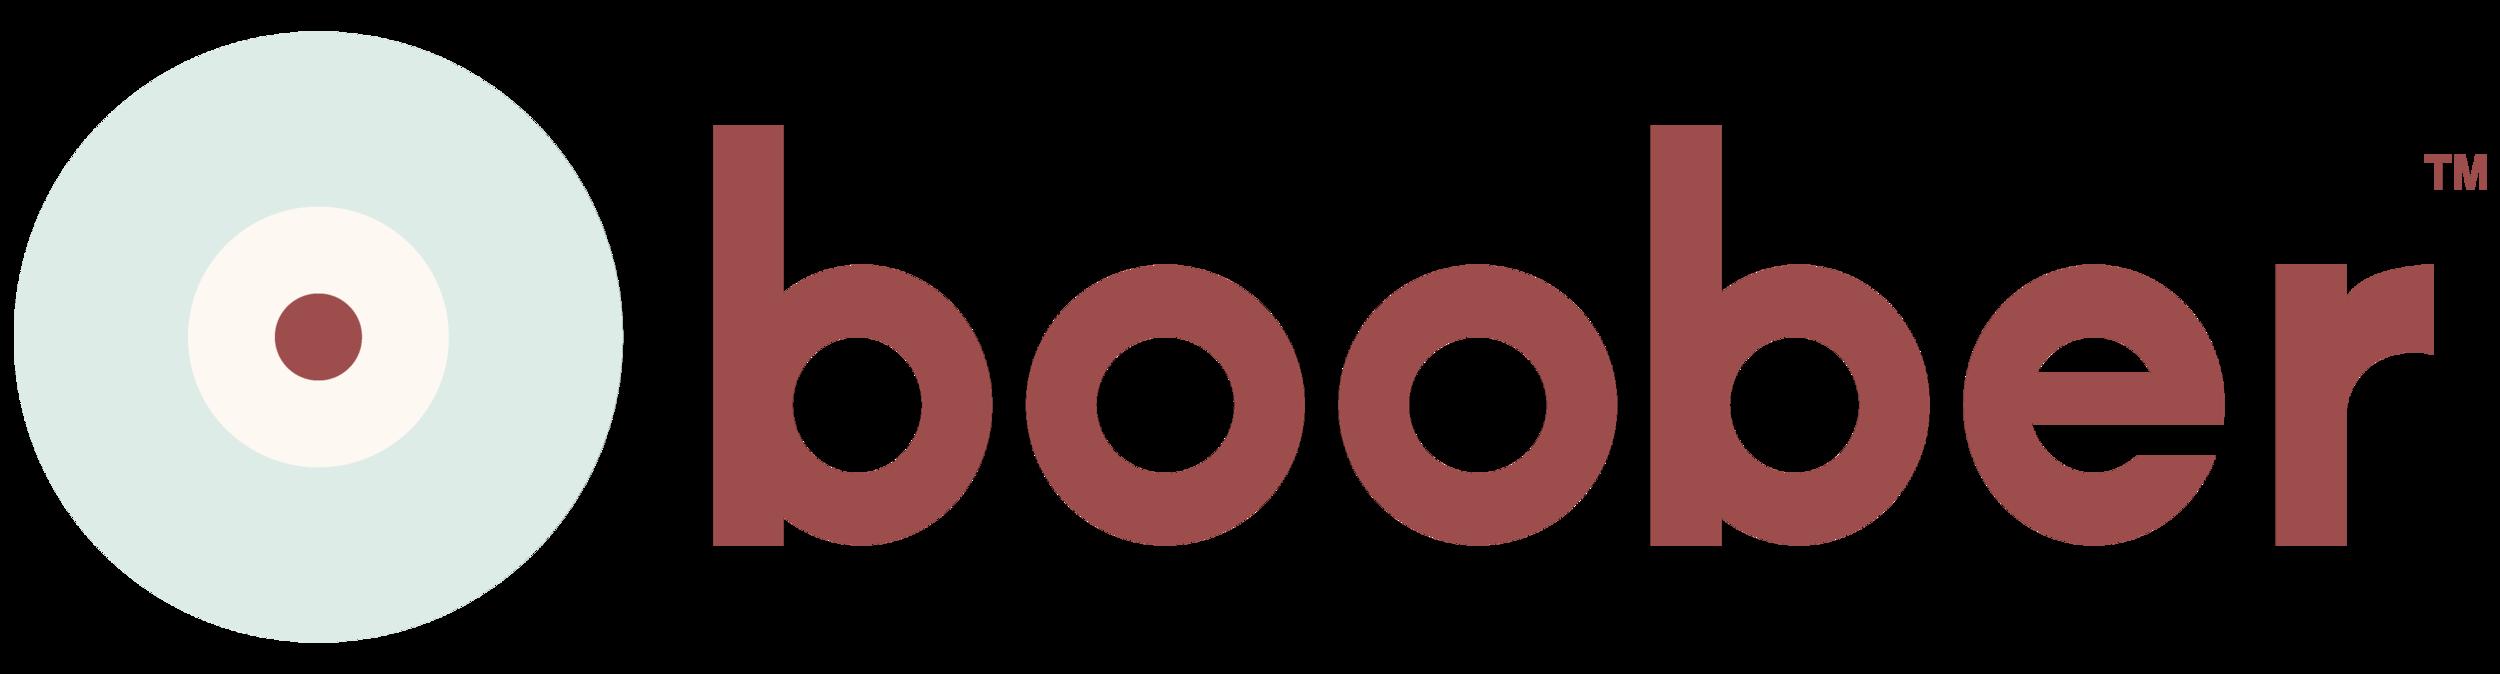 boober-logo-PRESS-high-res.png